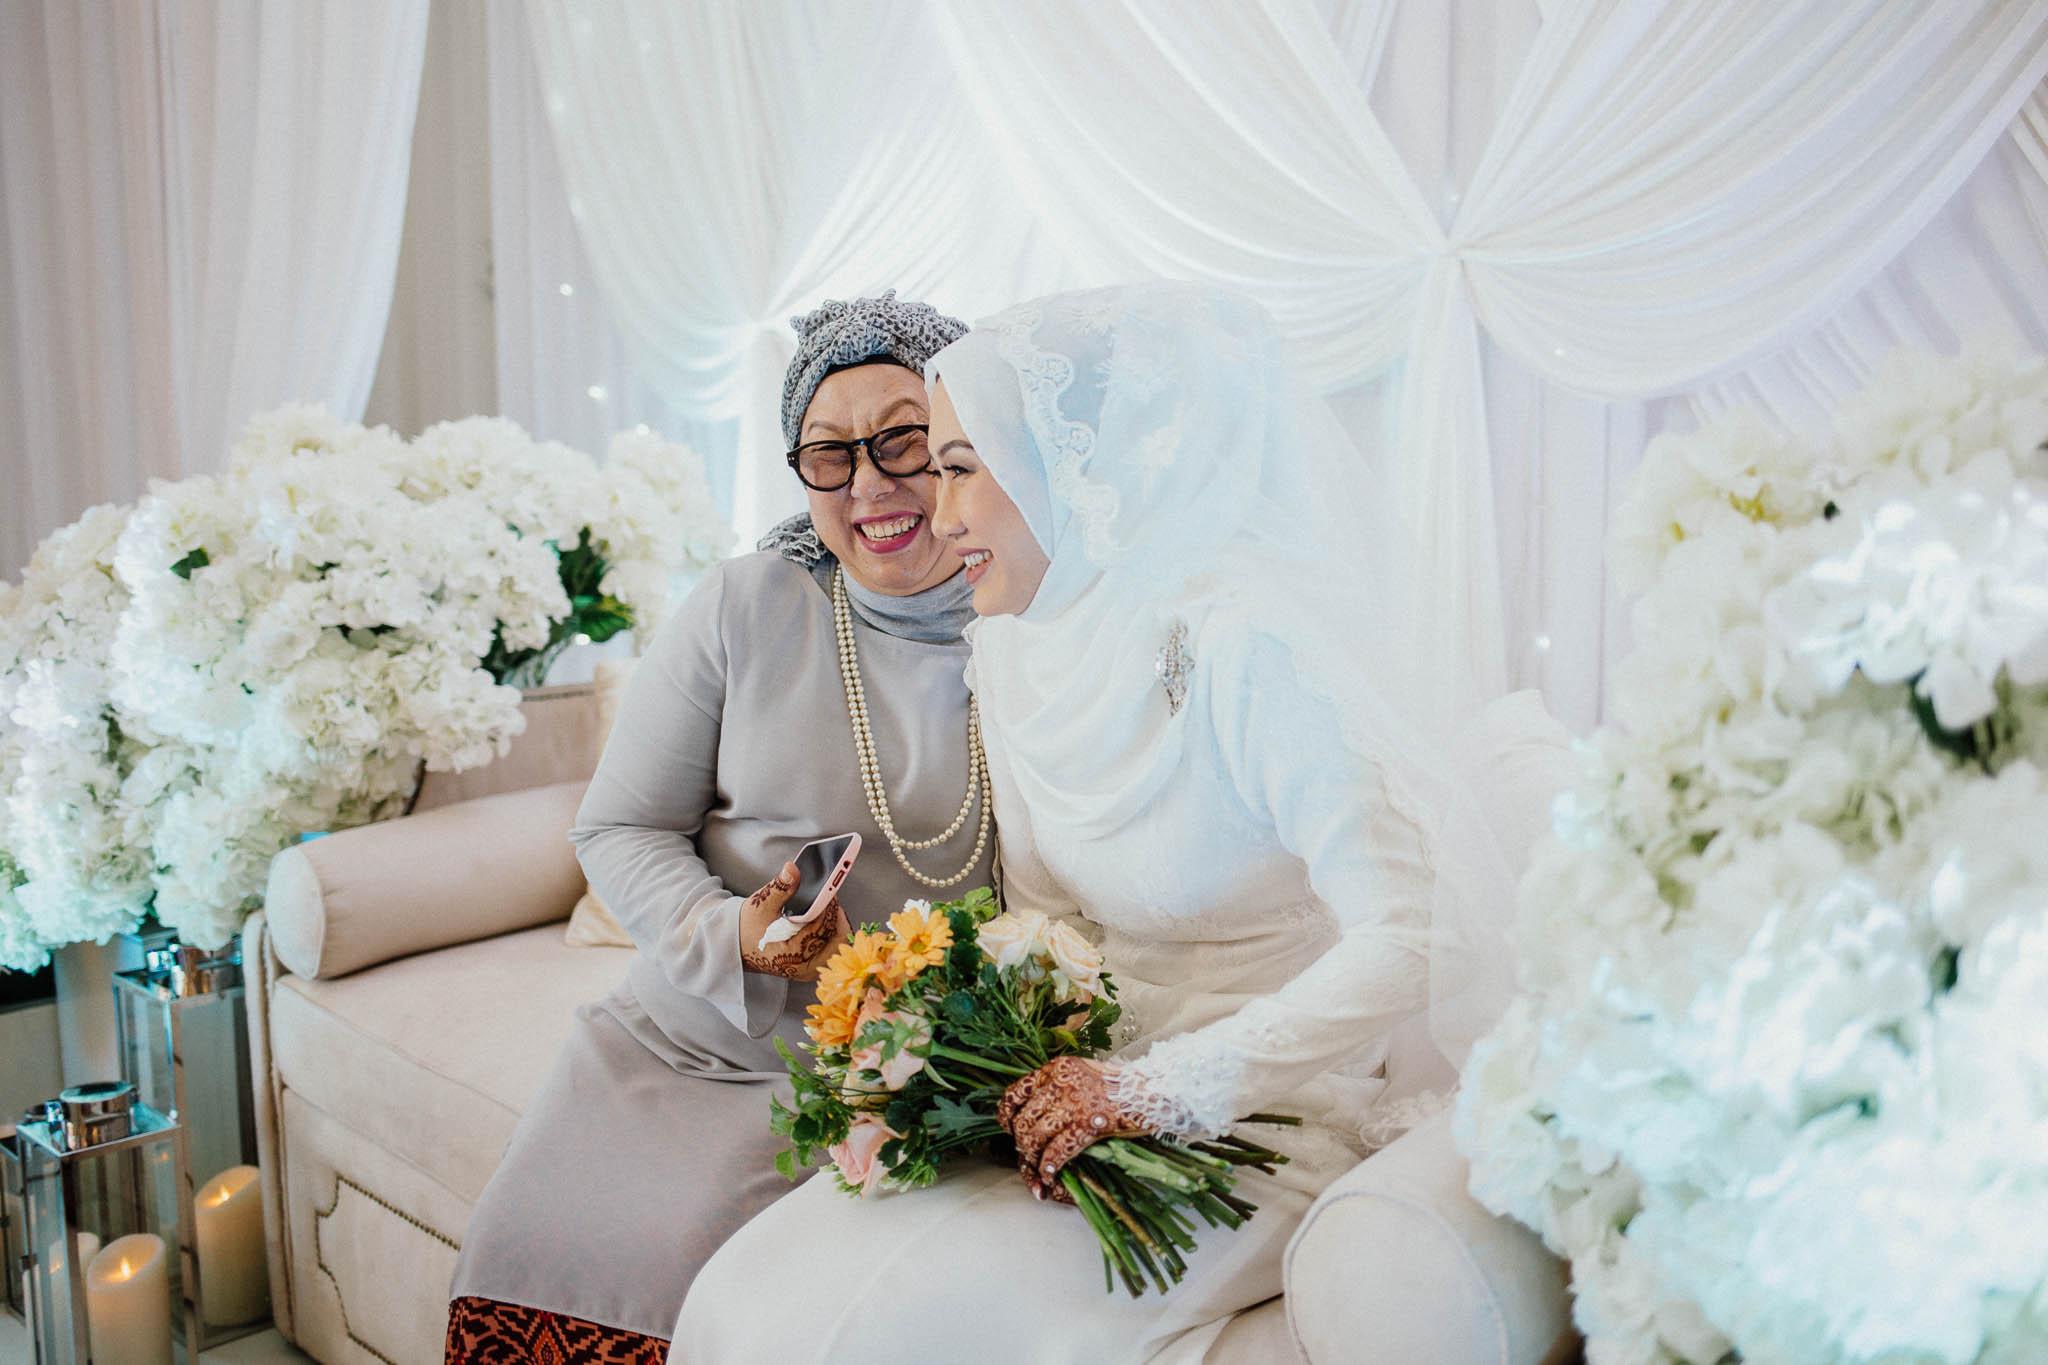 singapore-wedding-photographer-addafiq-nufail-015.jpg